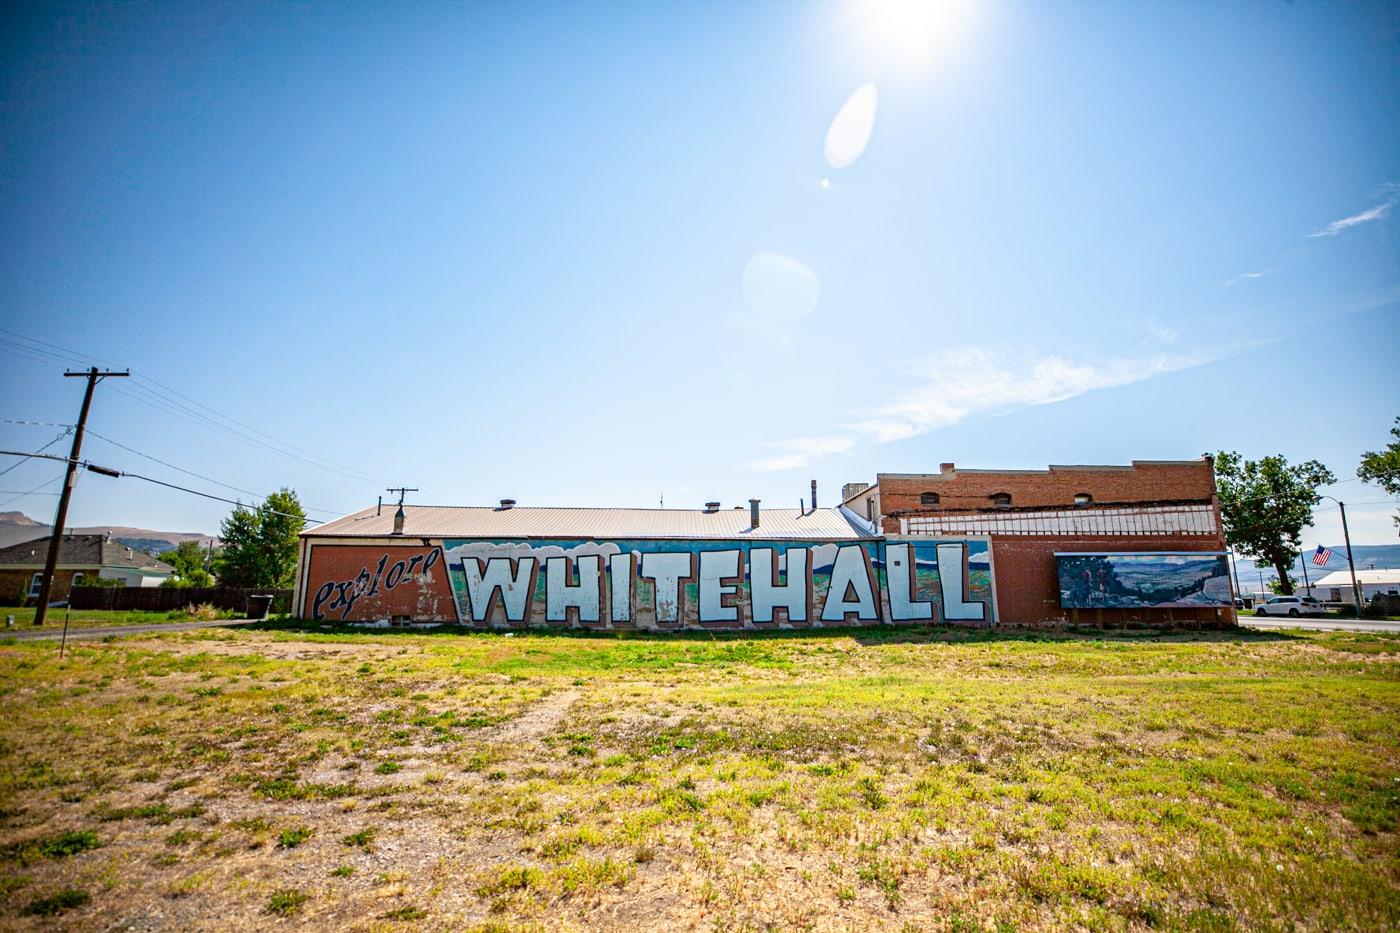 Whitehall Montana mural.